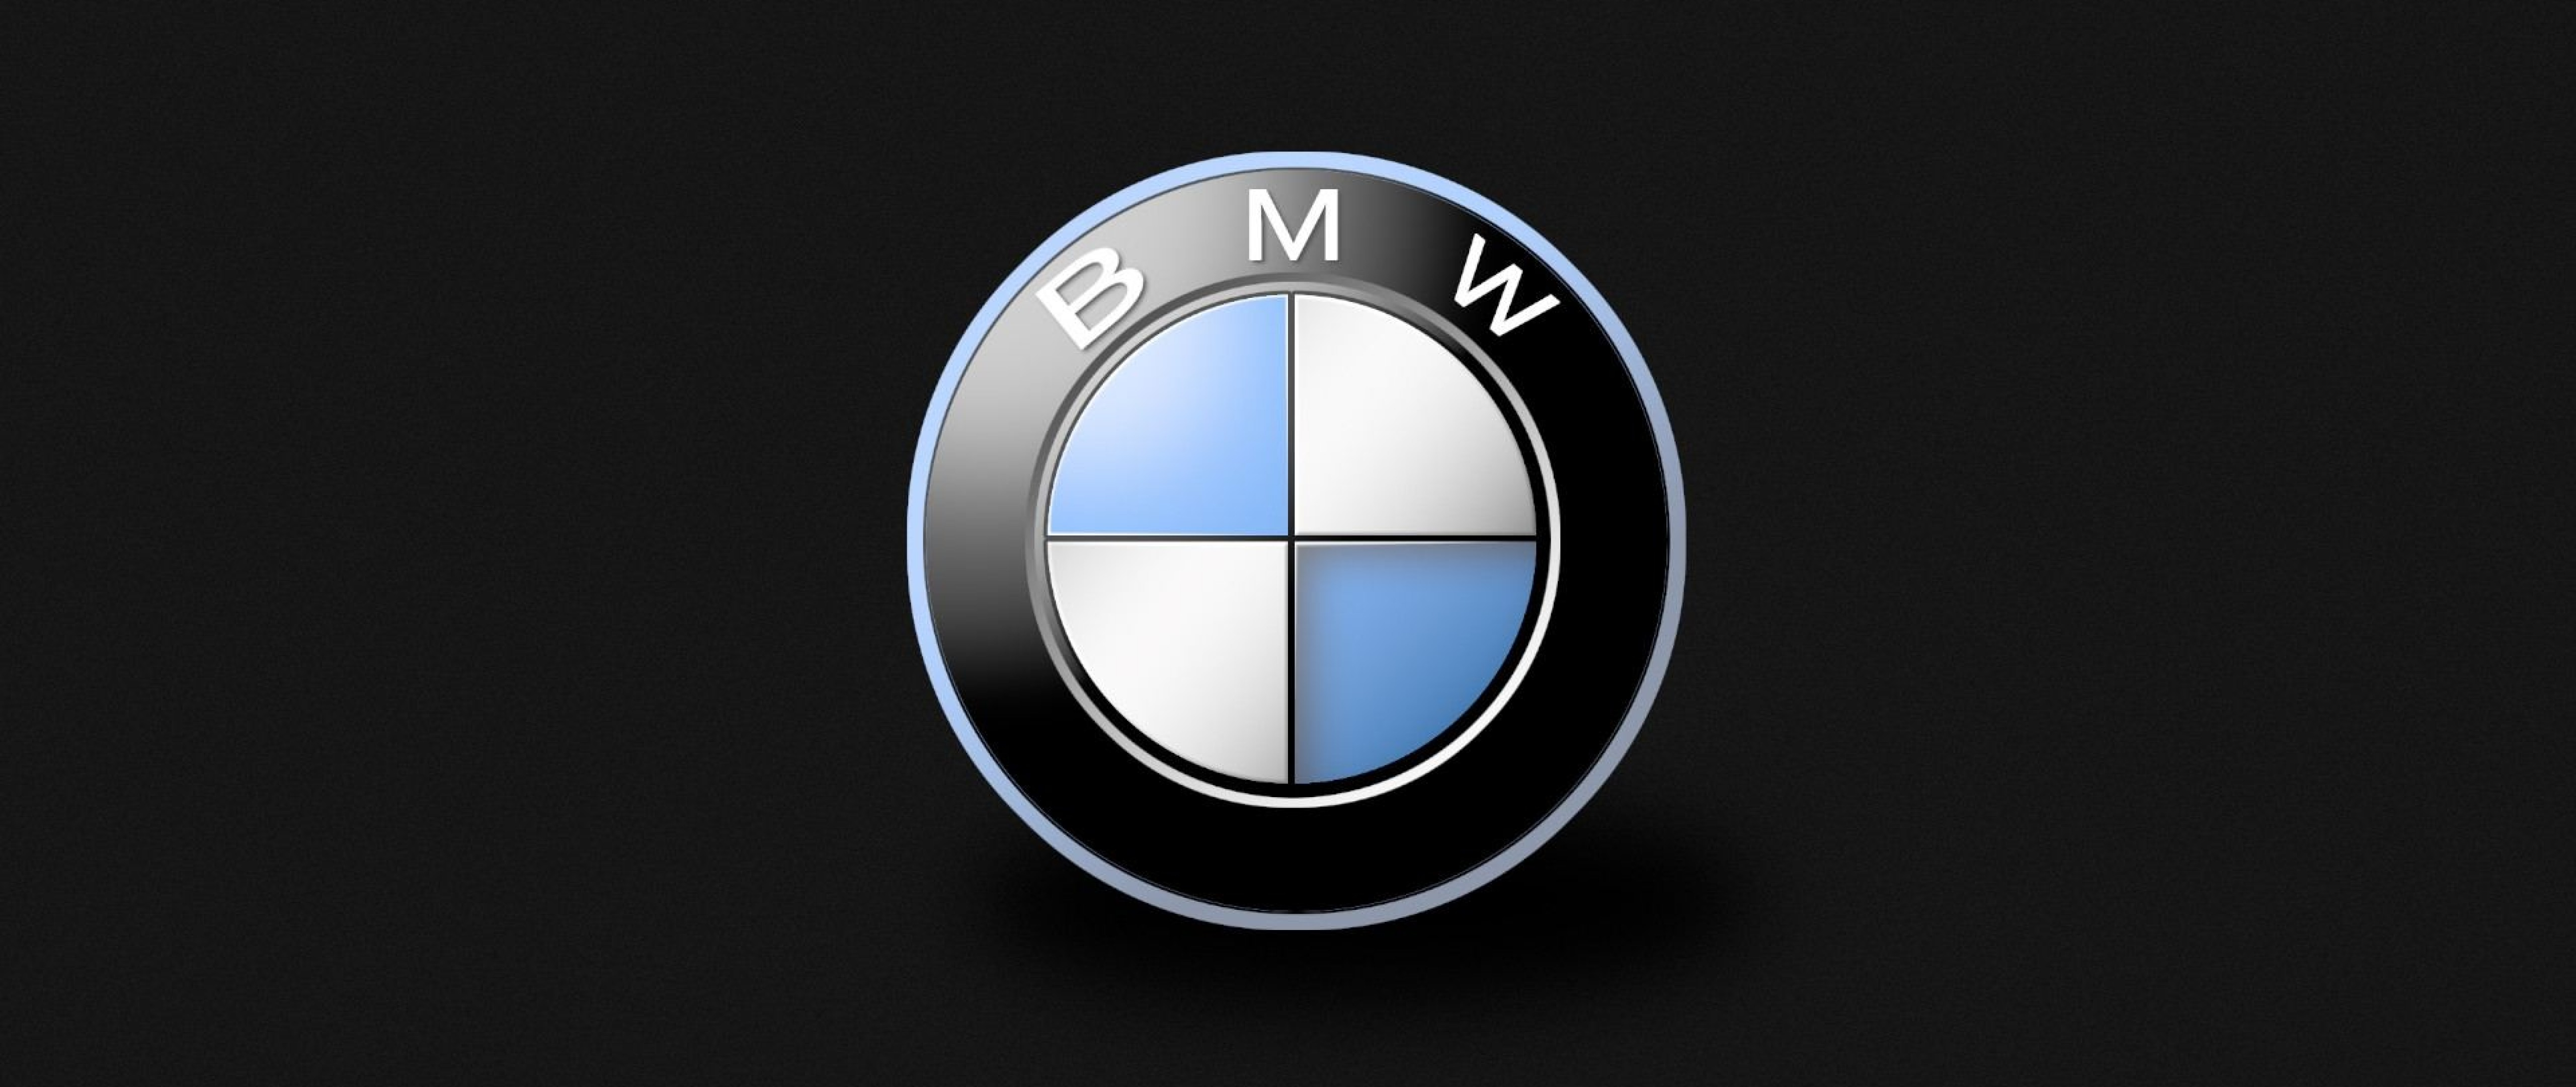 Bmw Logo Background Hd Wallpaper For Desktop And Mobiles 4k Ultra Hd Wide Tv Hd Wallpaper Wallpapers Net